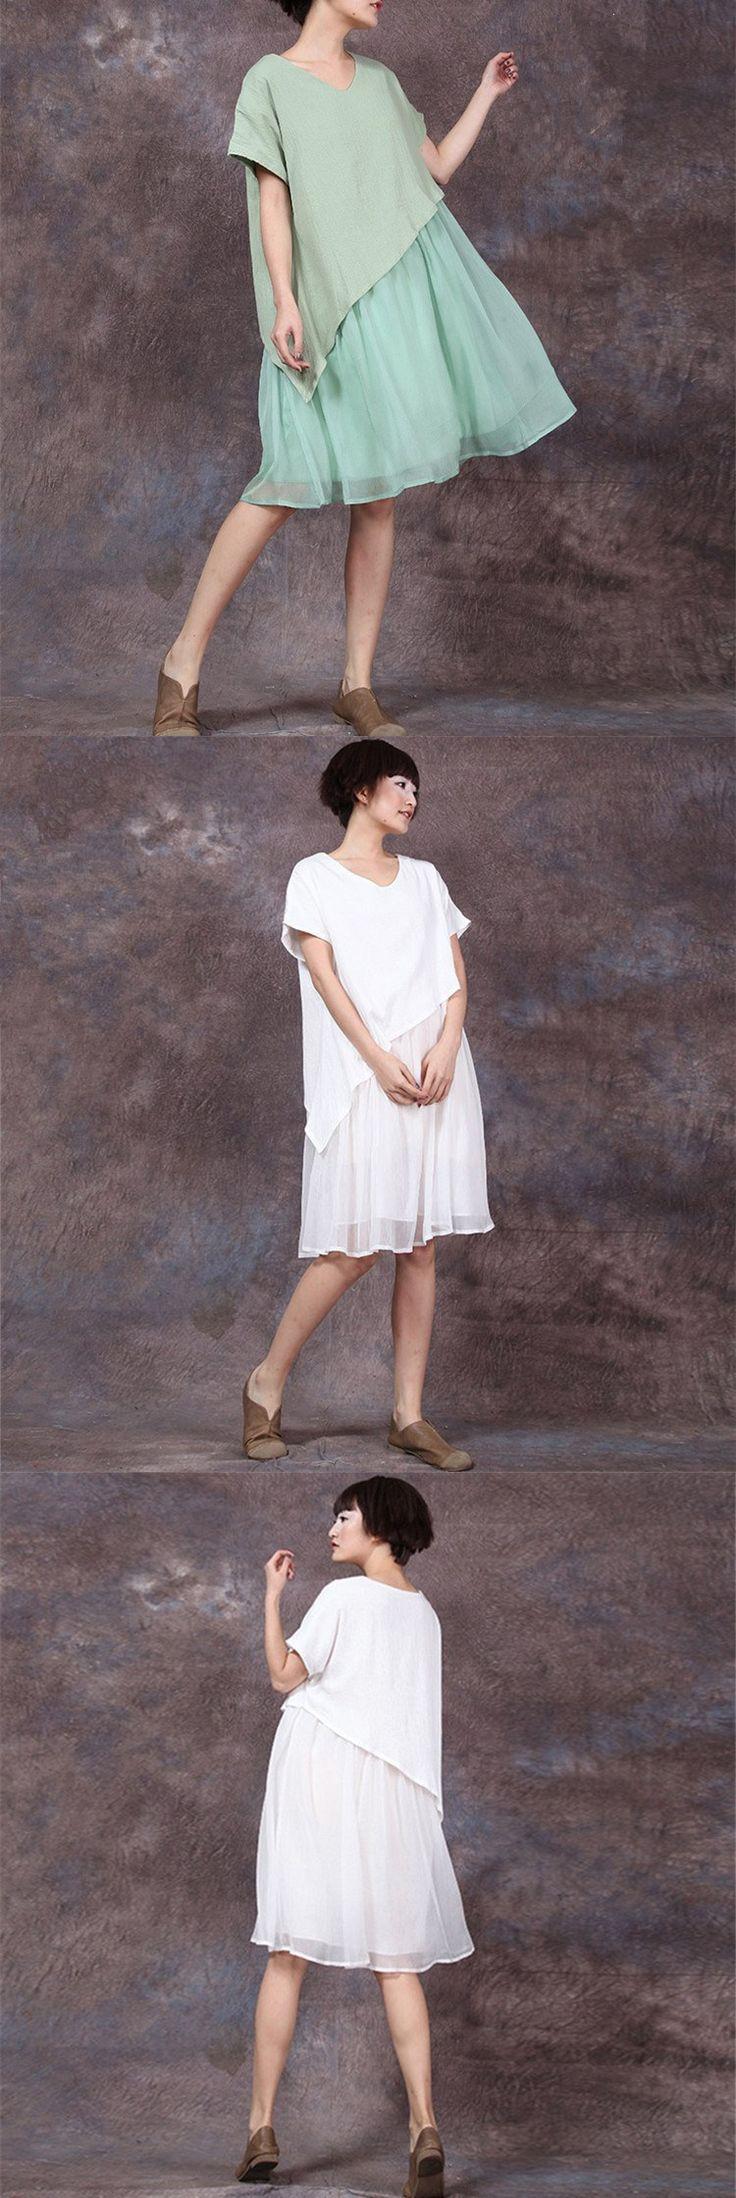 WOMEN V-NECK STITCHING LOOSE COTTON LINEN DRESS